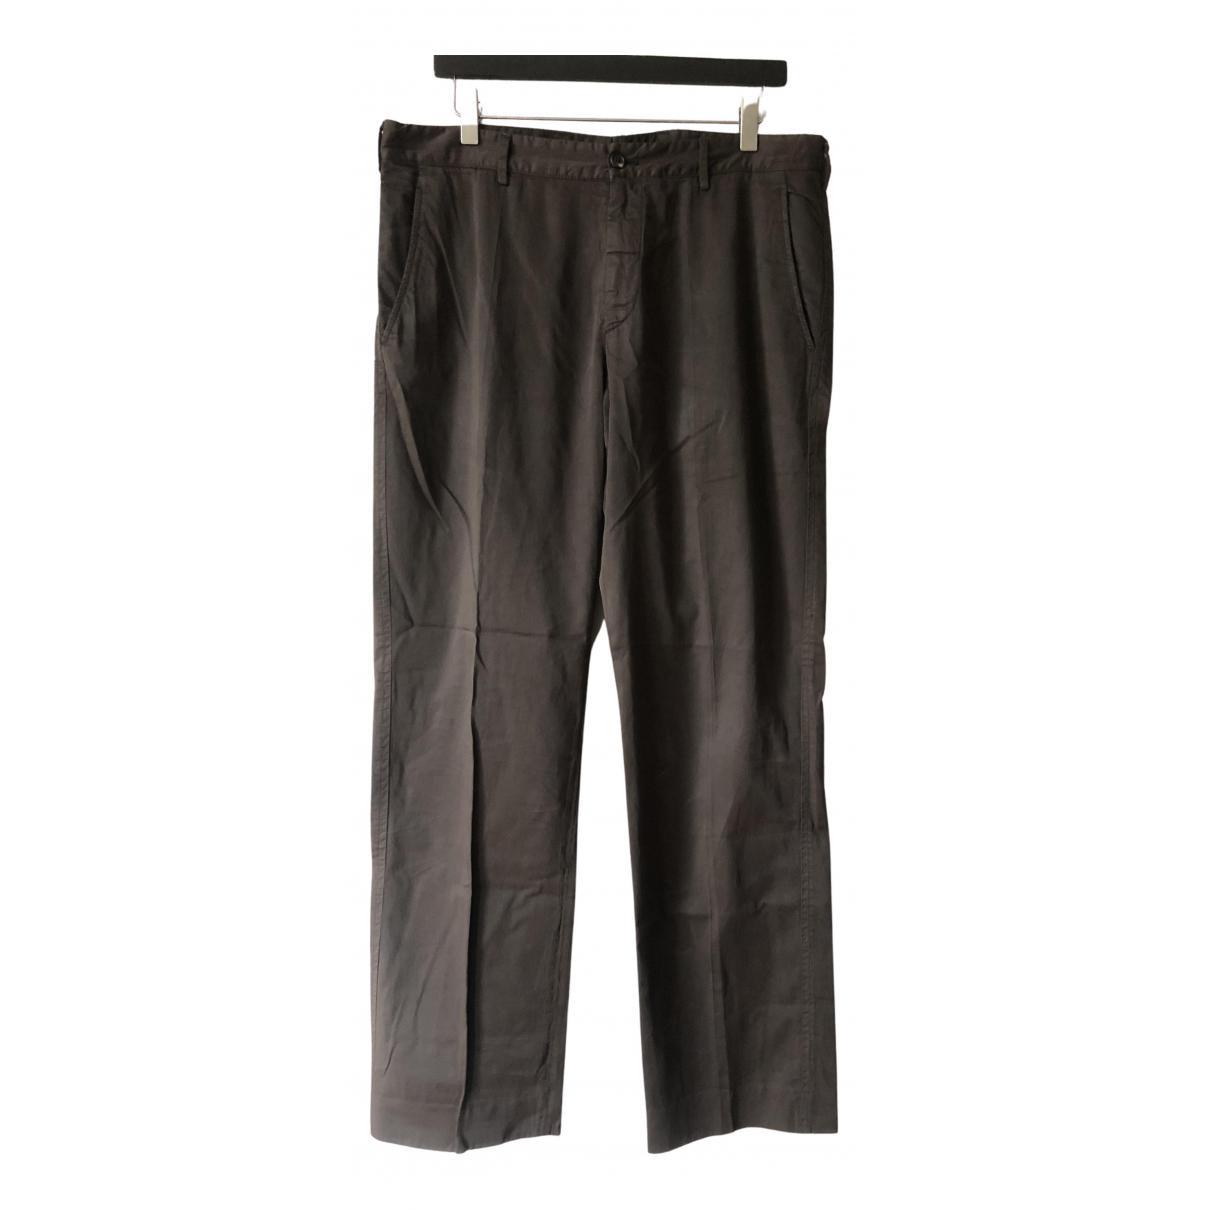 Prada - Pantalon   pour homme en coton - marron